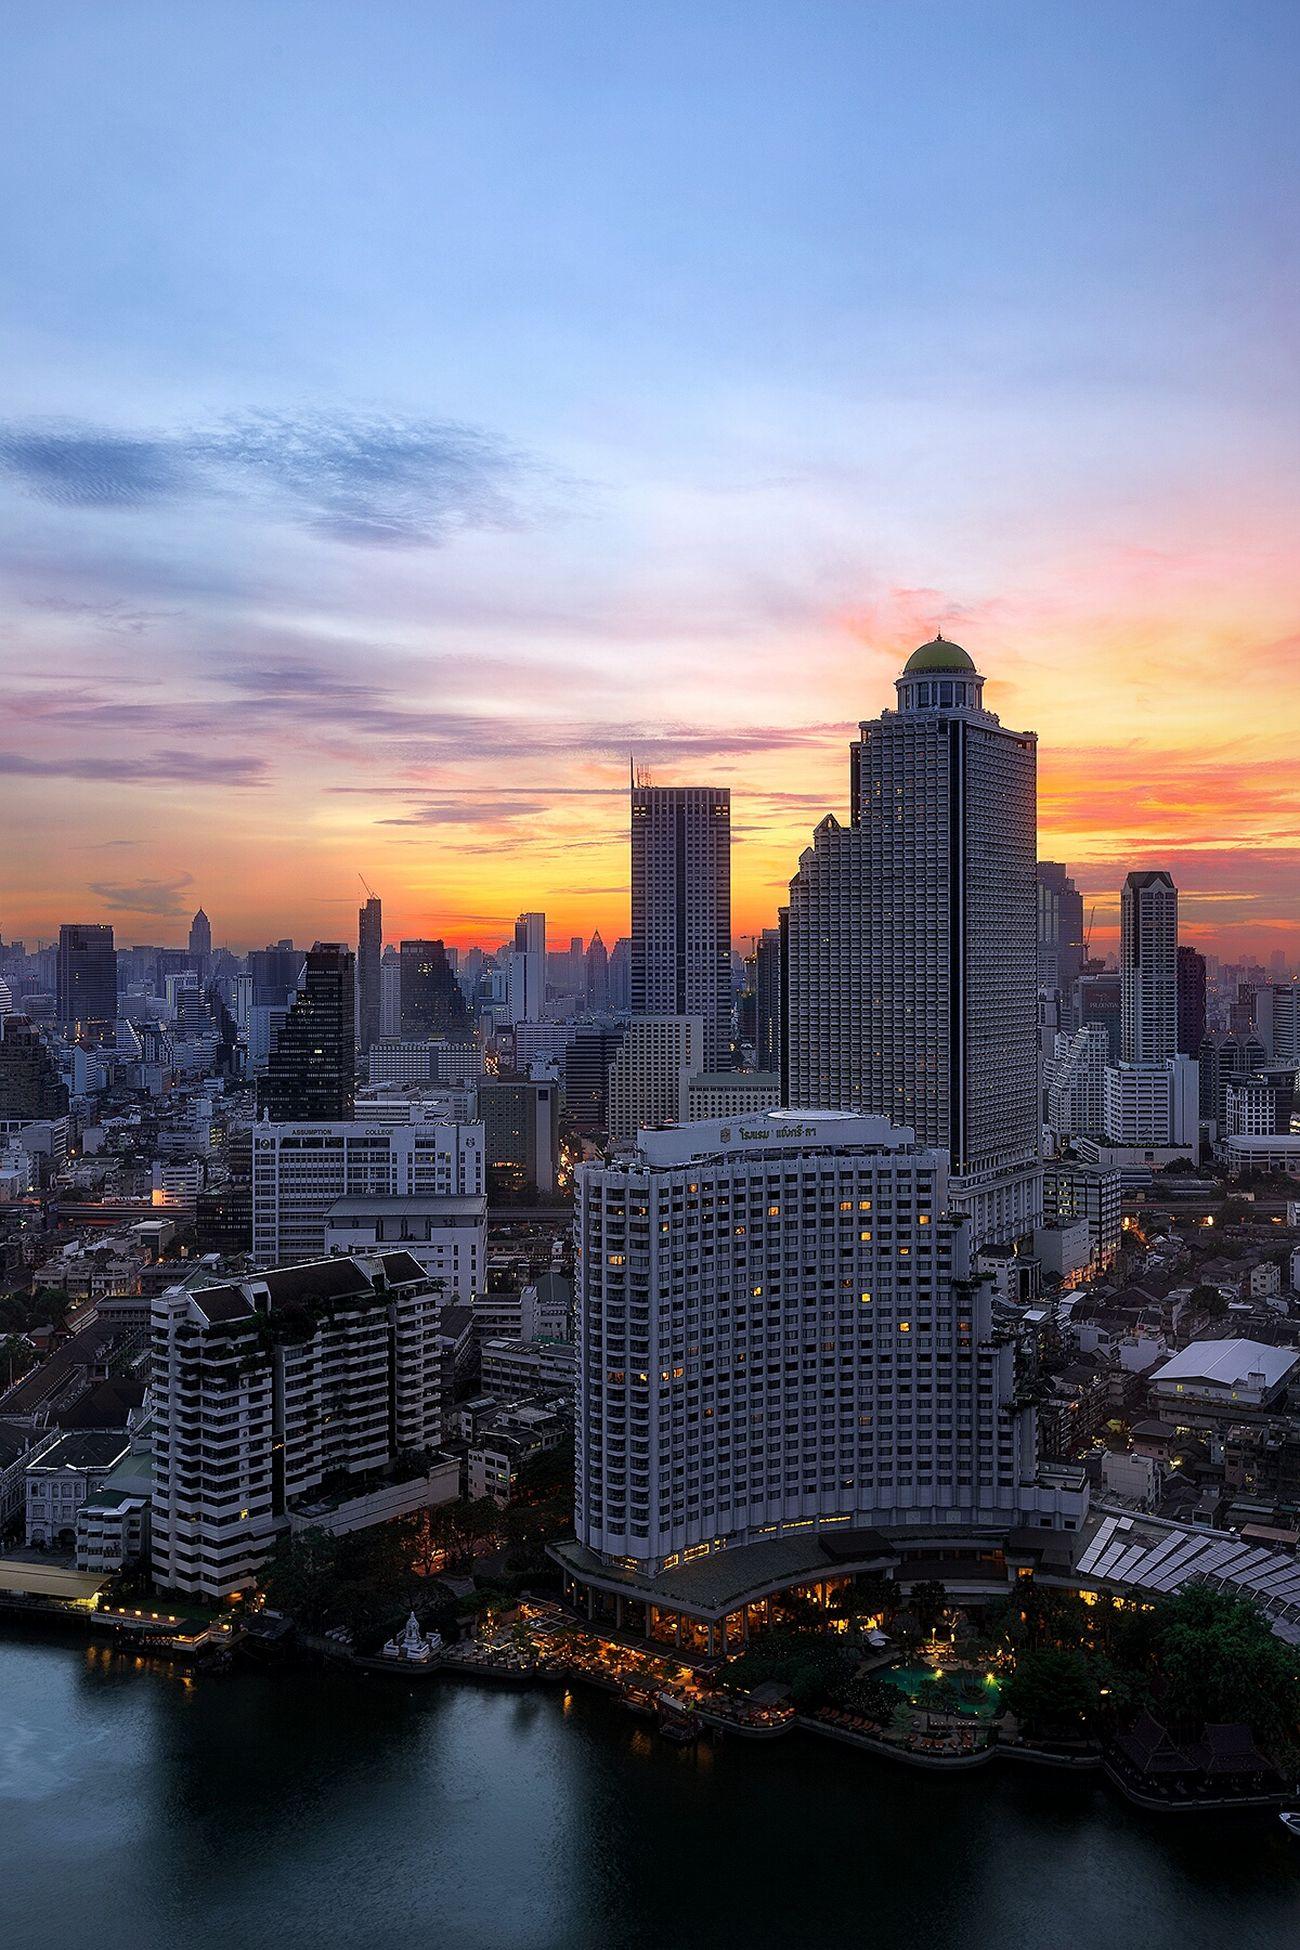 Aerial Shot City Travel EyeEm Best Edits EyeEmBestPics EyeEm Best Shots Travel Photography Sunset Cityscapes Landscape_Collection Urban Landscape Bangkok Bangkok Thailand. Thailand ASIA